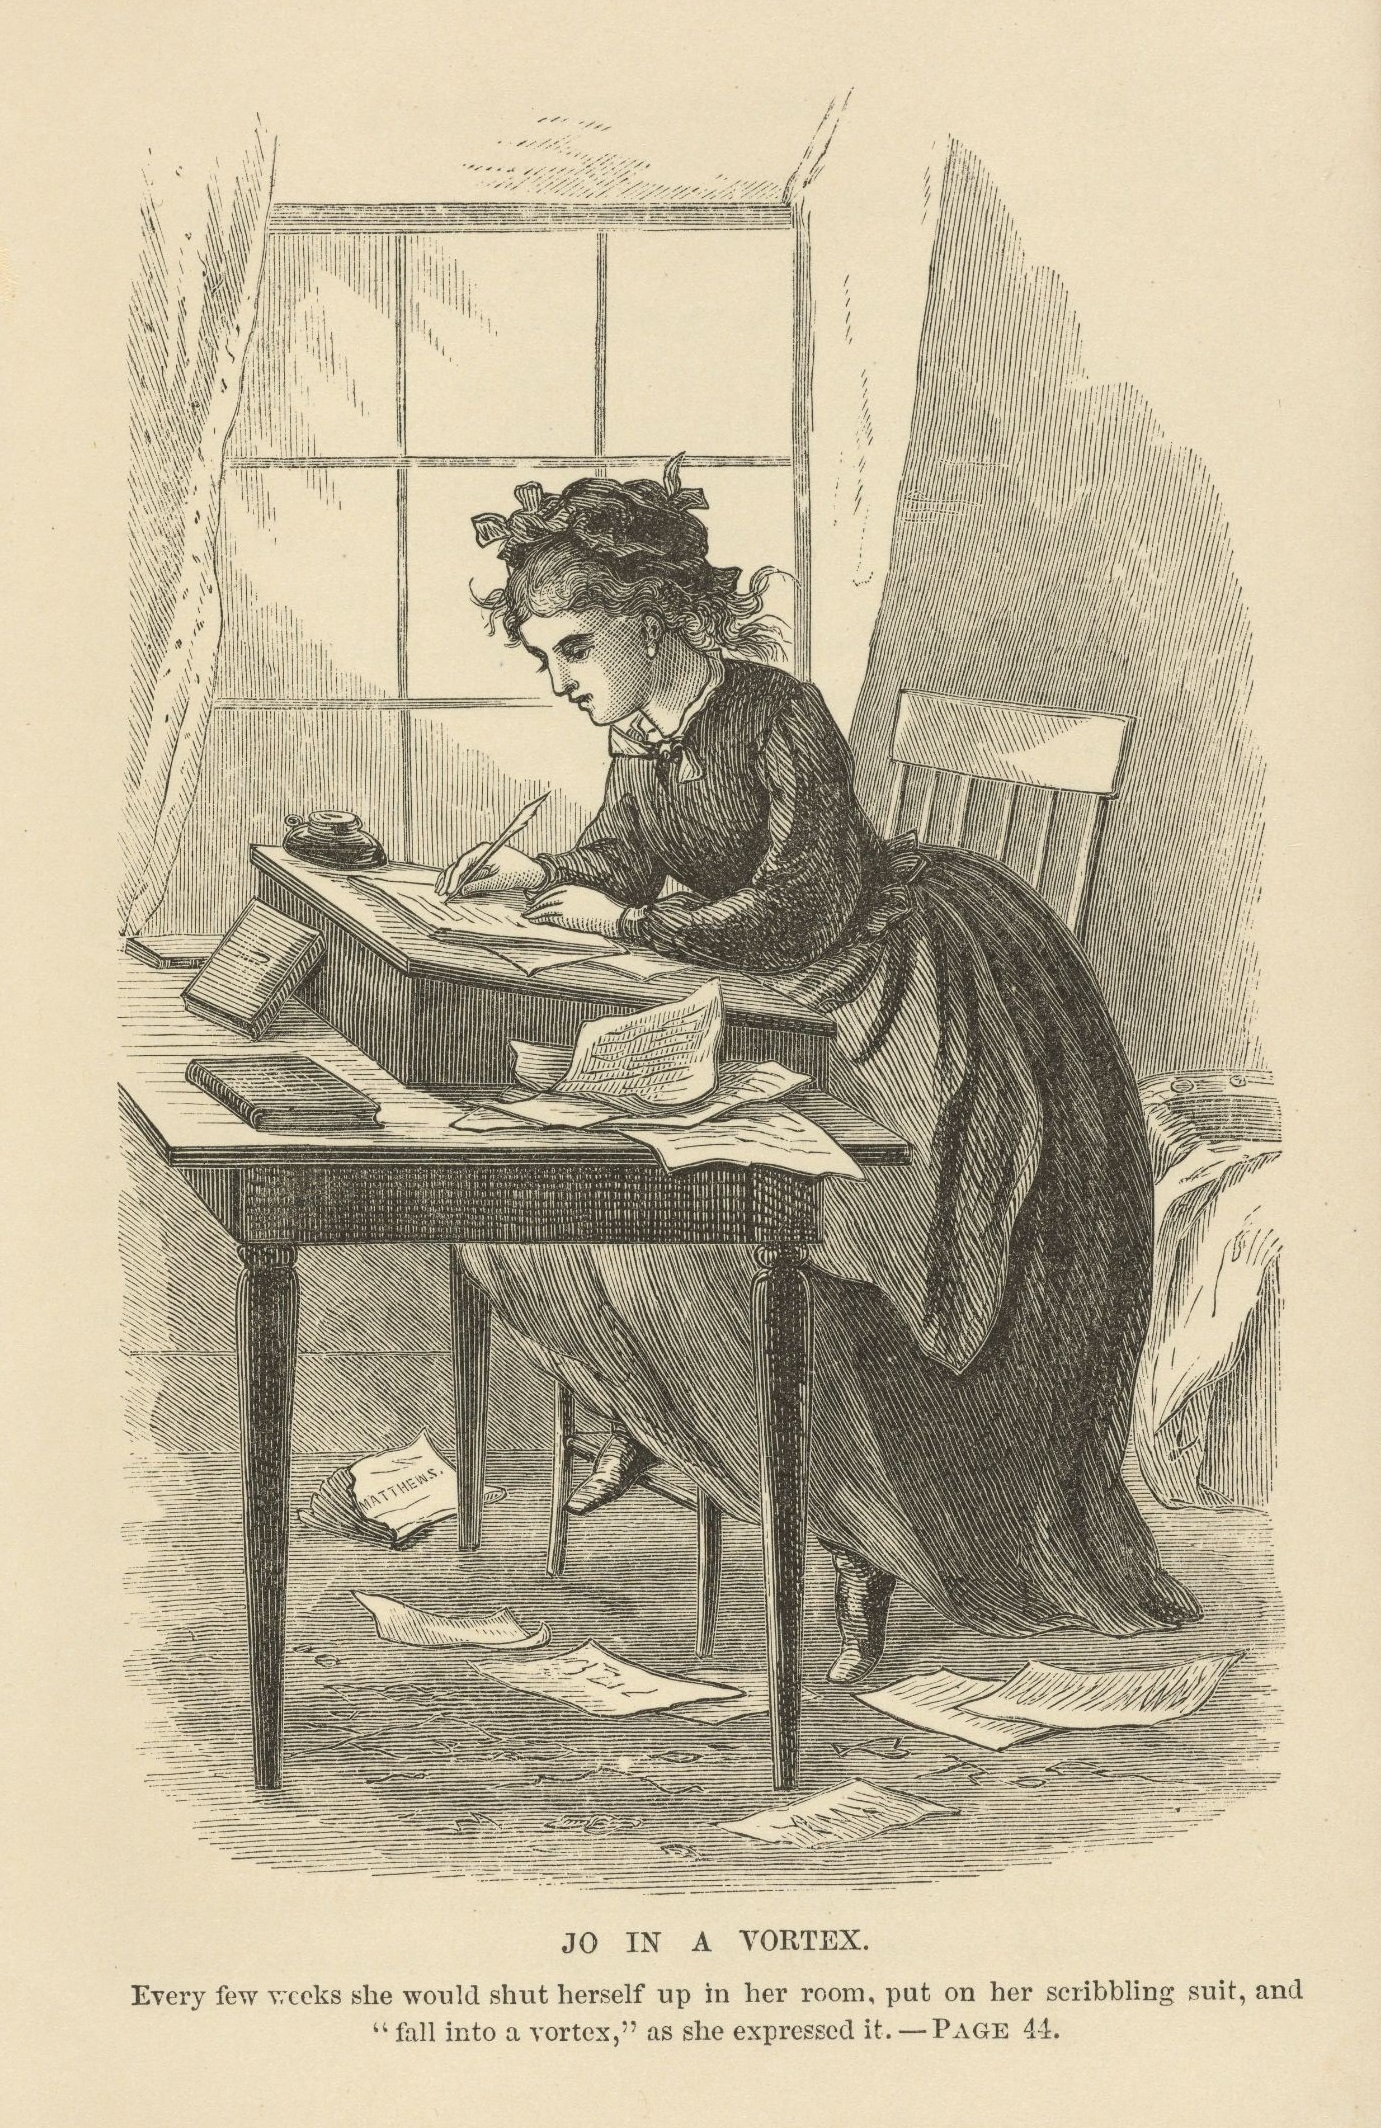 https://upload.wikimedia.org/wikipedia/commons/e/ea/Houghton_AC85.A%E2%84%93194L.1869_pt.2aa_-_Little_Women%2C_vol_2%2C_illustration_45.jpg